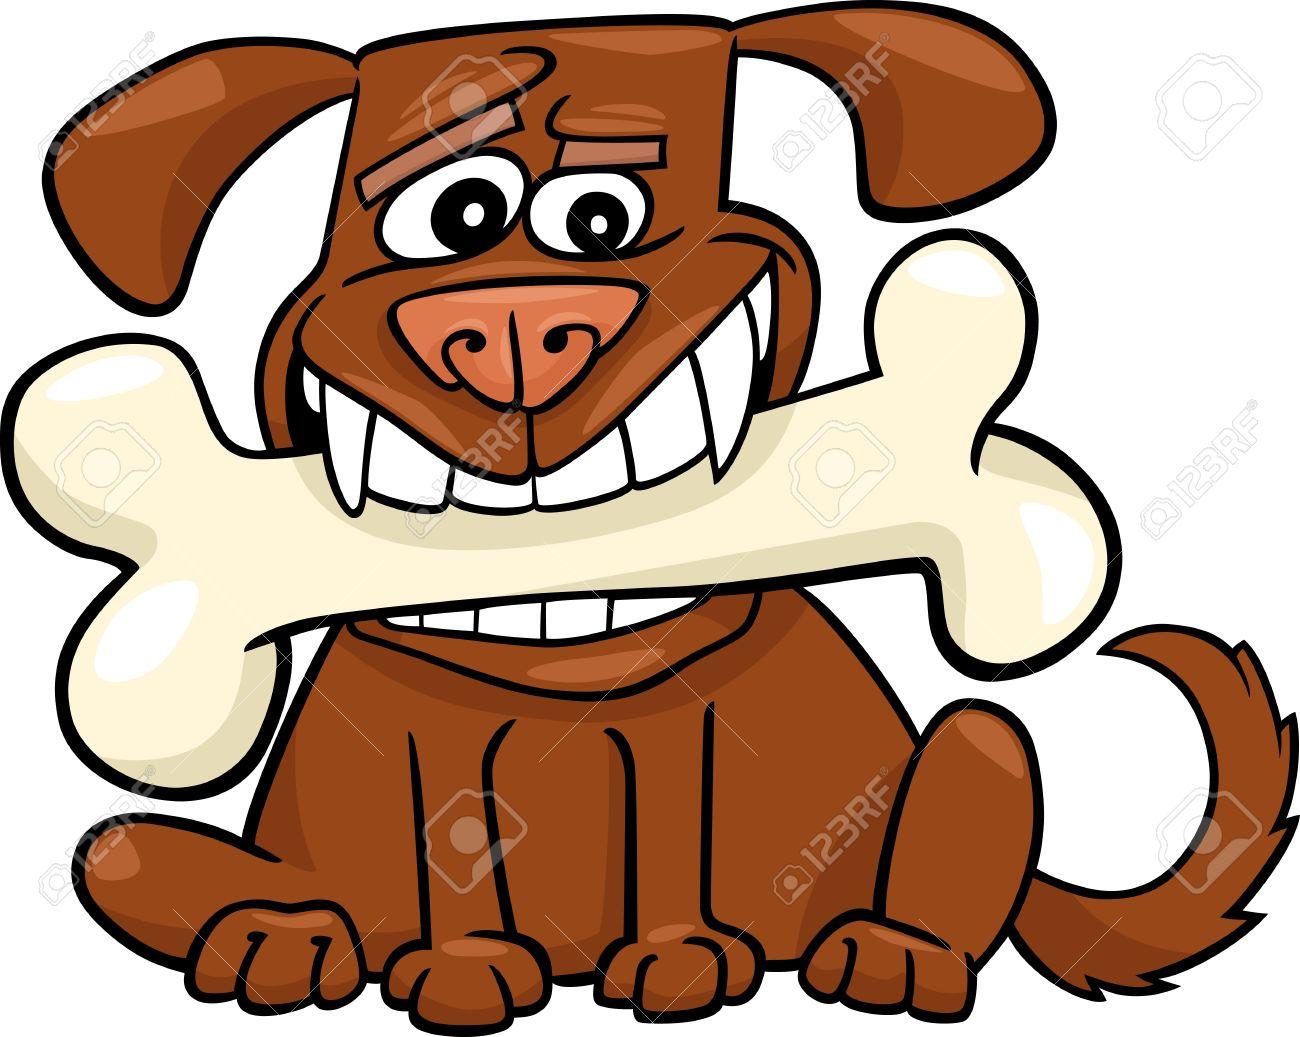 Cartoon Illustration of Funny Dog with Big Bone Stock Vector - 14295354